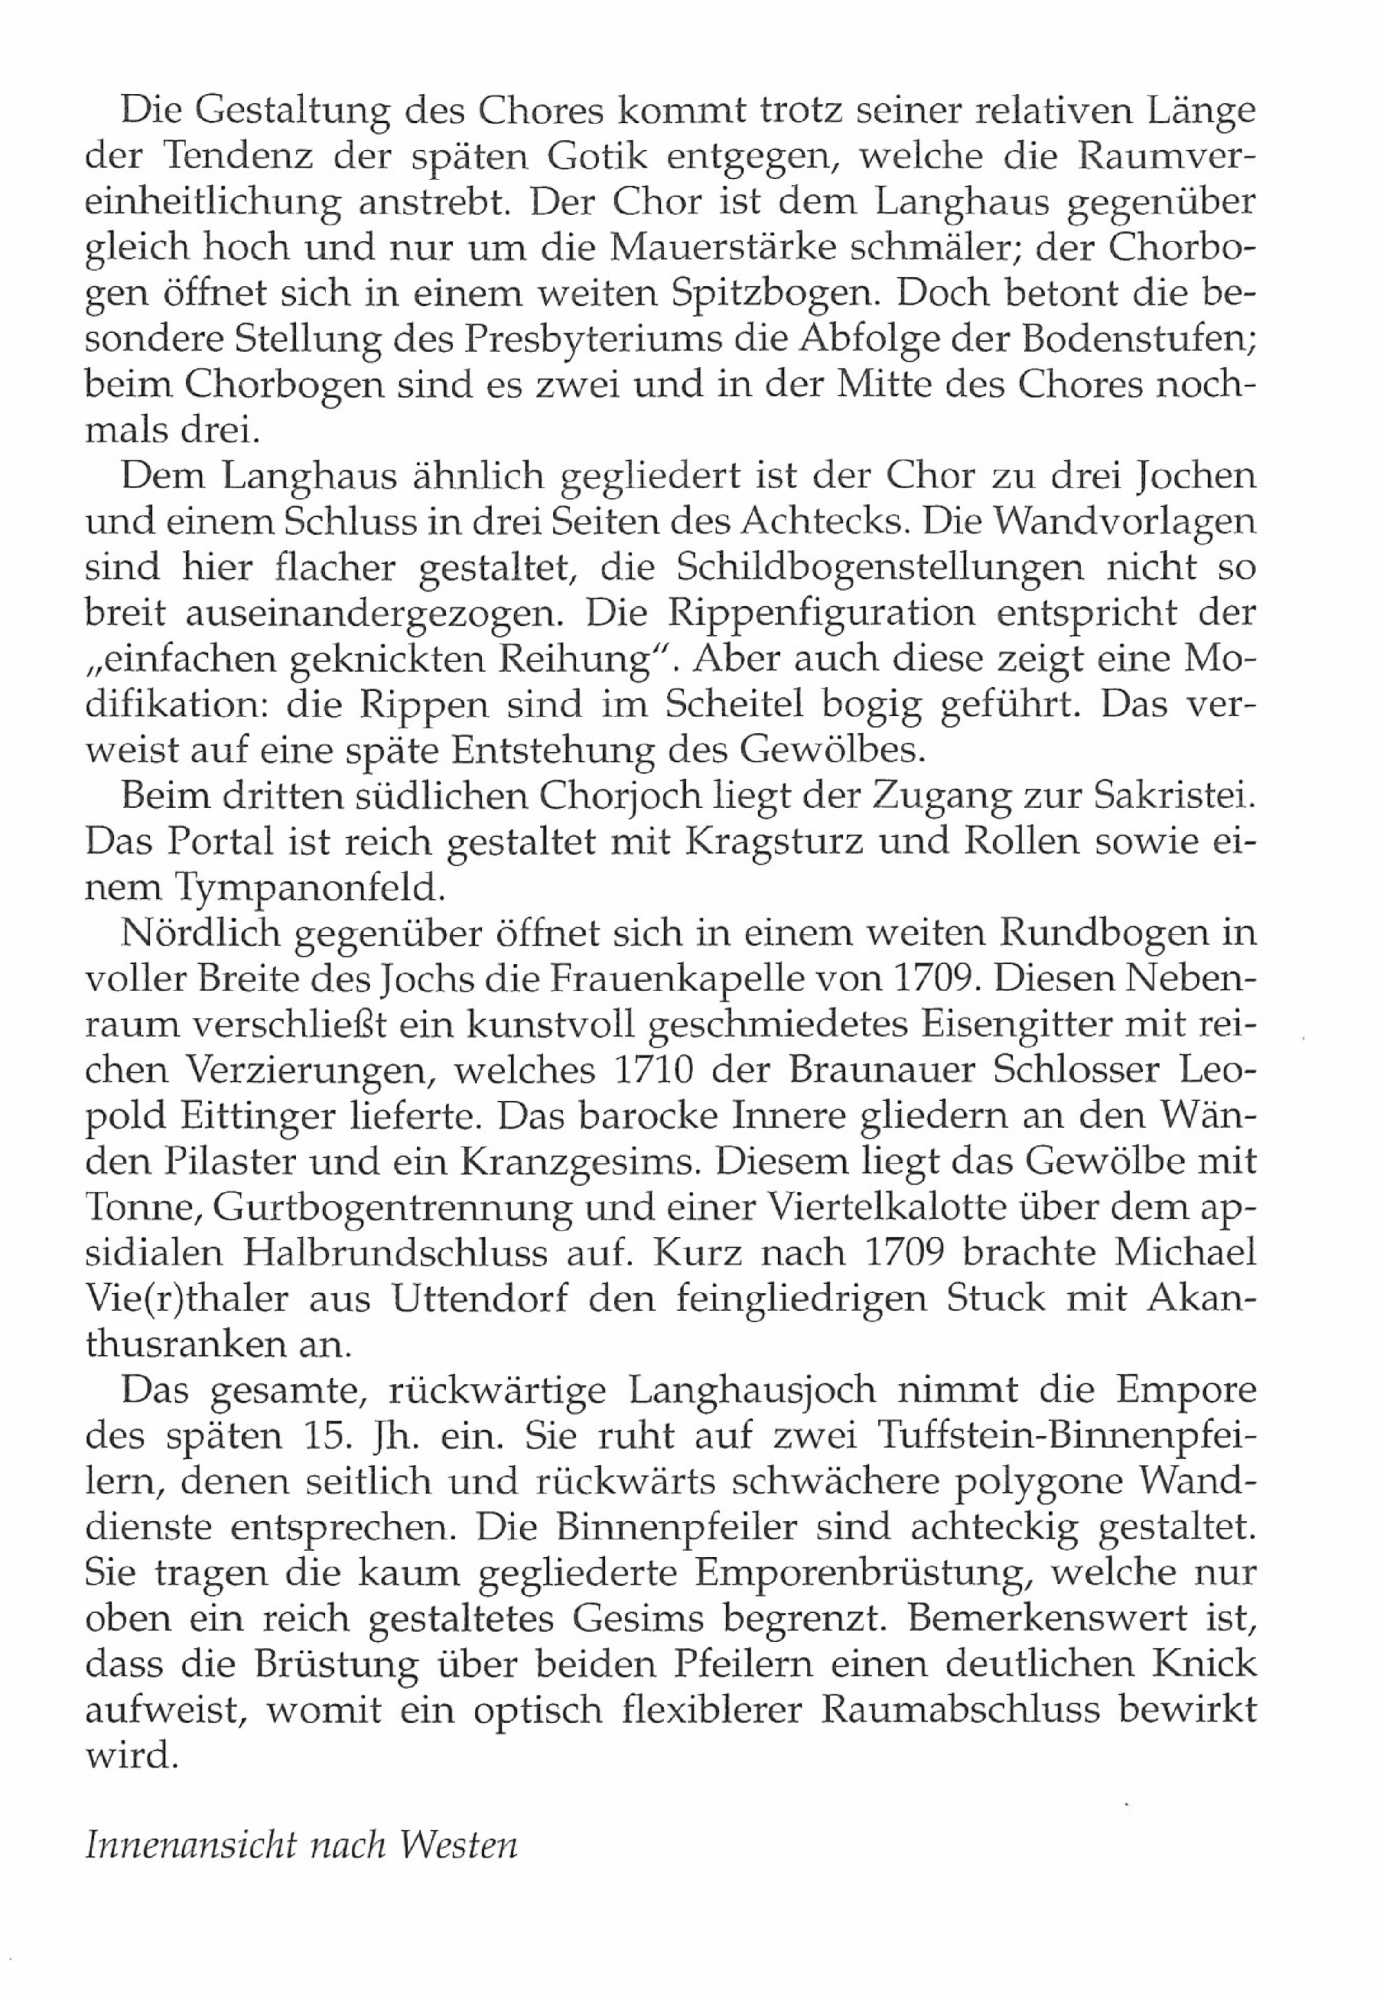 Erlach Kirchenführer 011